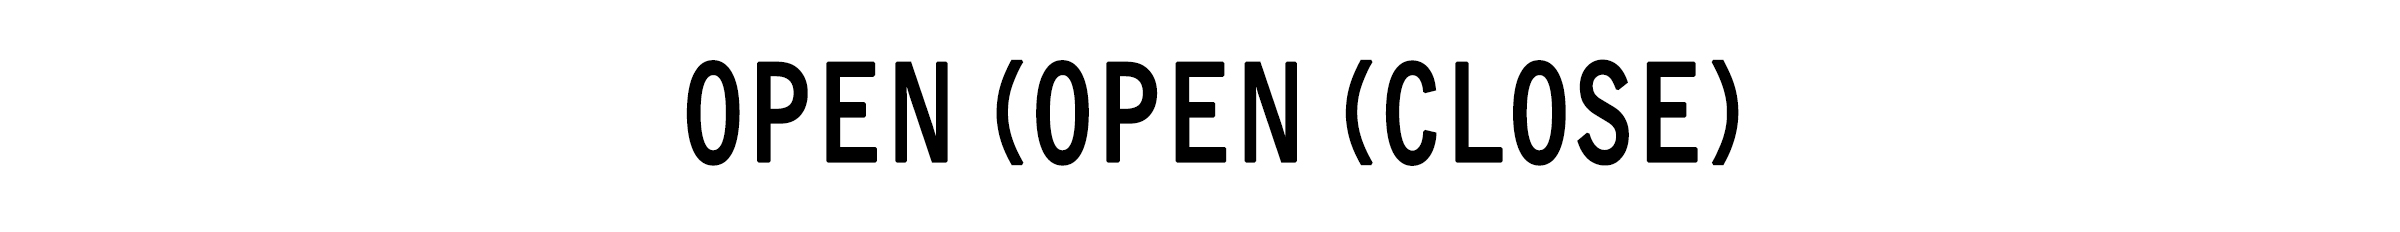 Open (Open (Close)